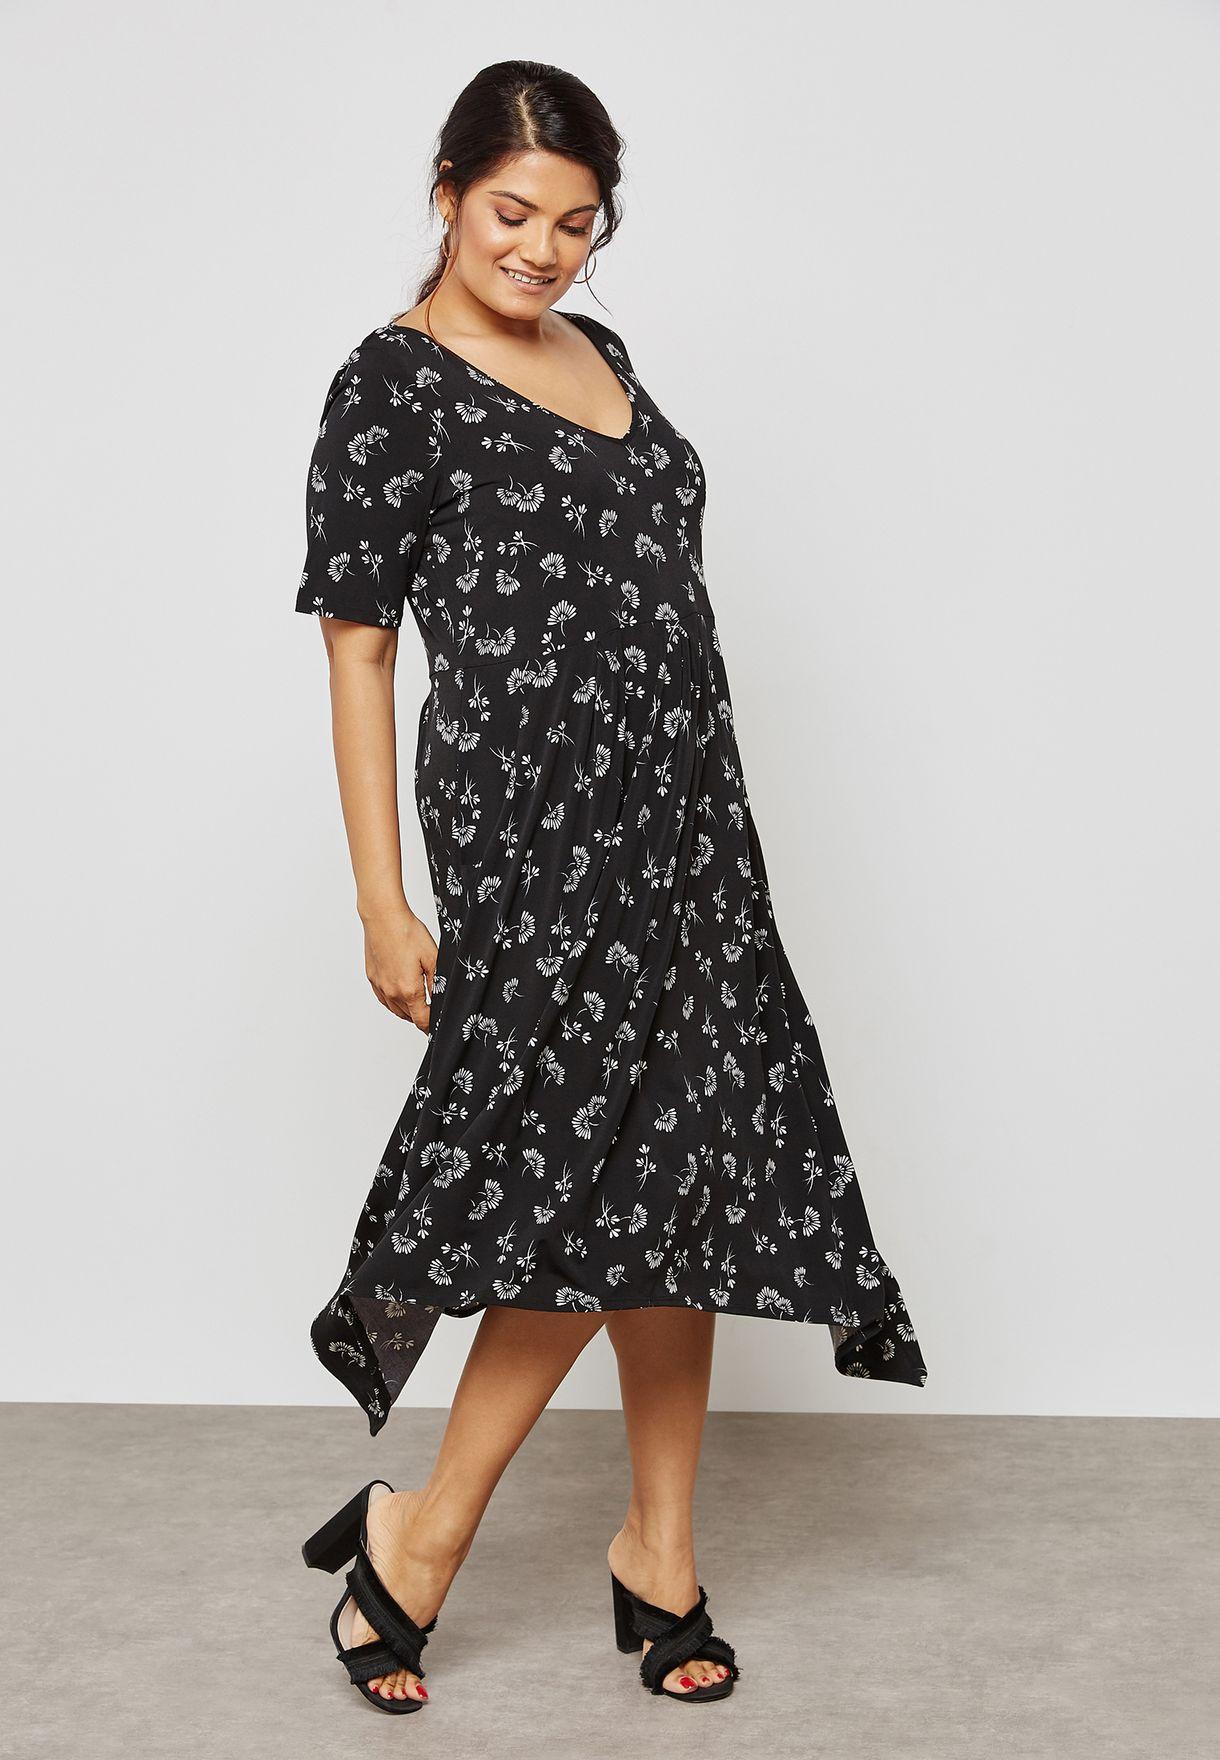 032a3ea39a Shop Evans prints Floral Print Skater Dress 04S20AMUL for Women in ...